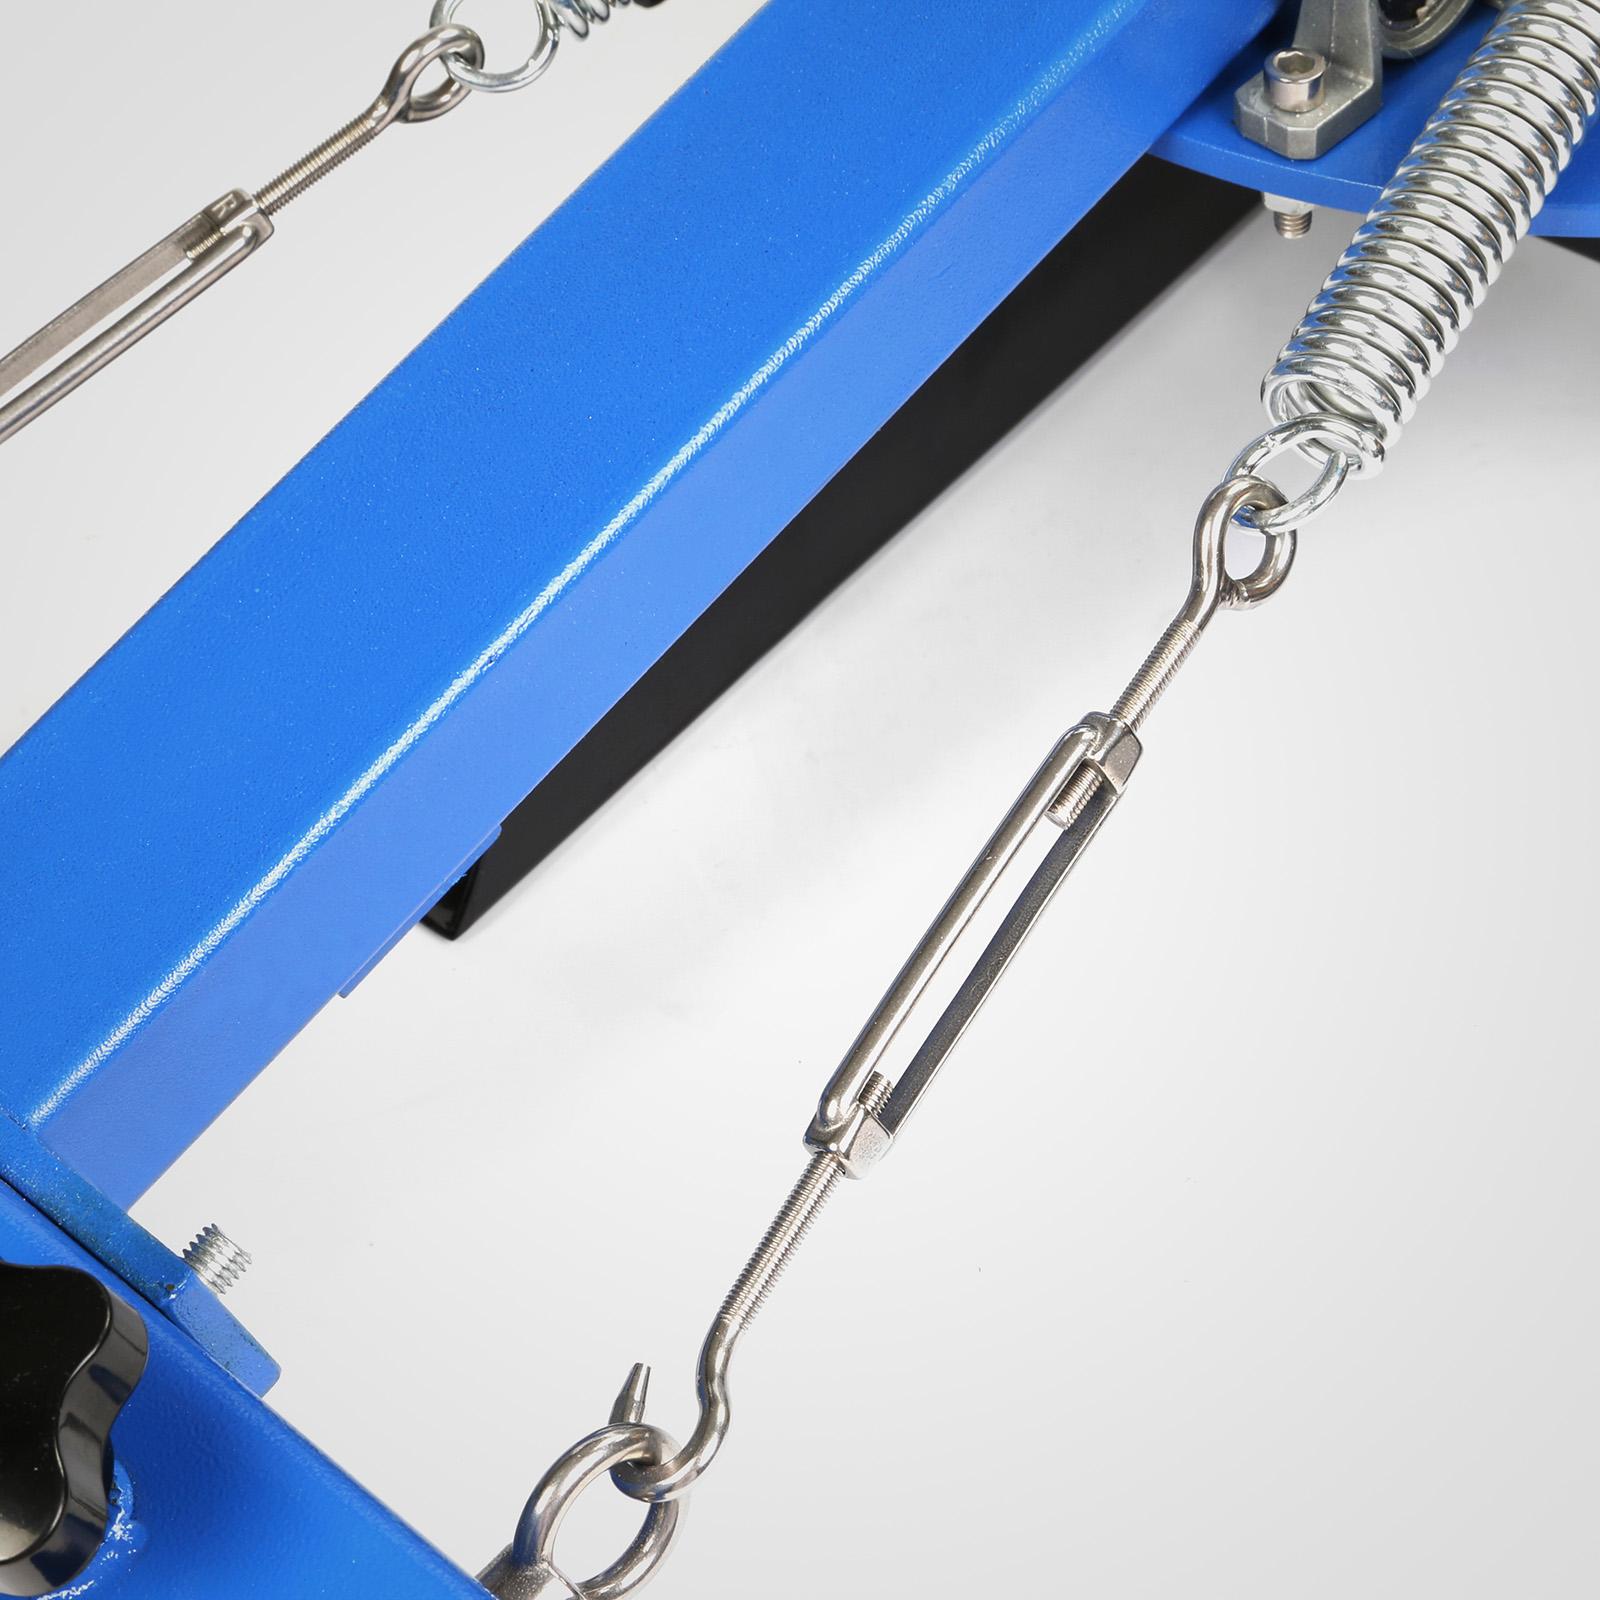 4 Color 2 Station Silk Screen Printing Machine Wood Carousel Printer WHOLESALE 827843288910